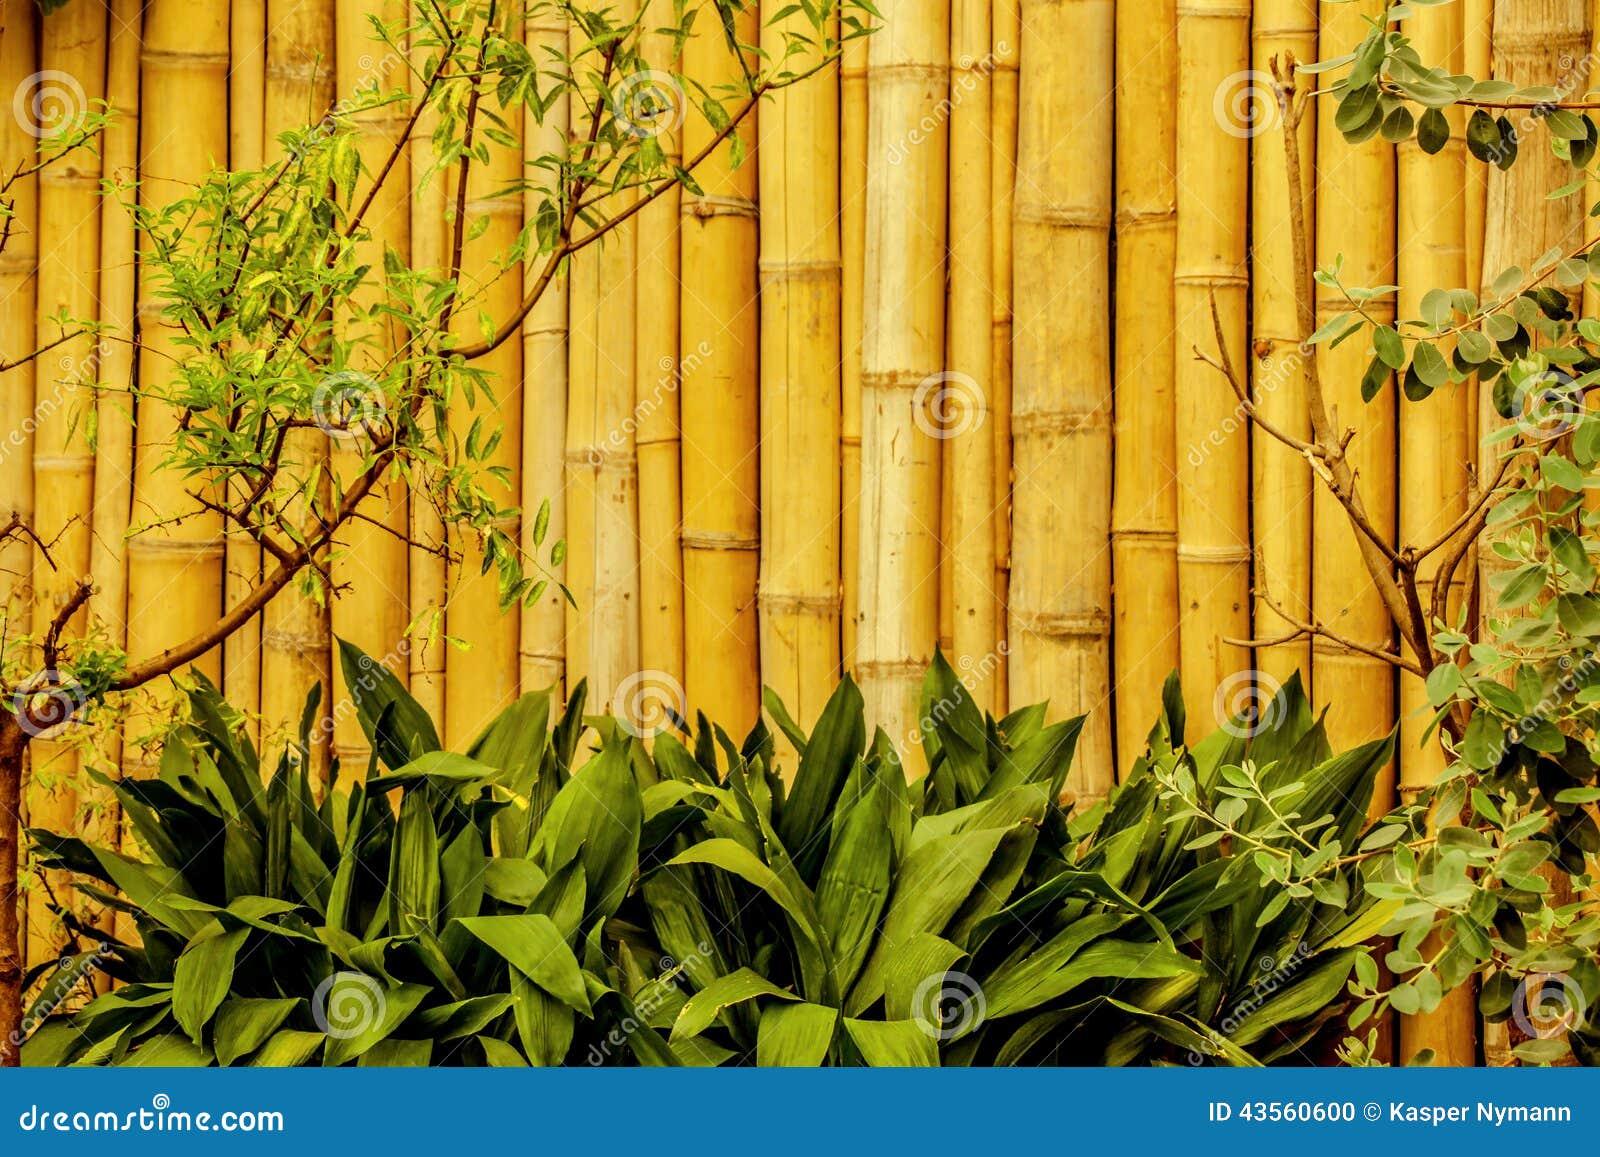 Bambu para jardin consejos prcticos sobre sistemas de - Bambu para jardin ...